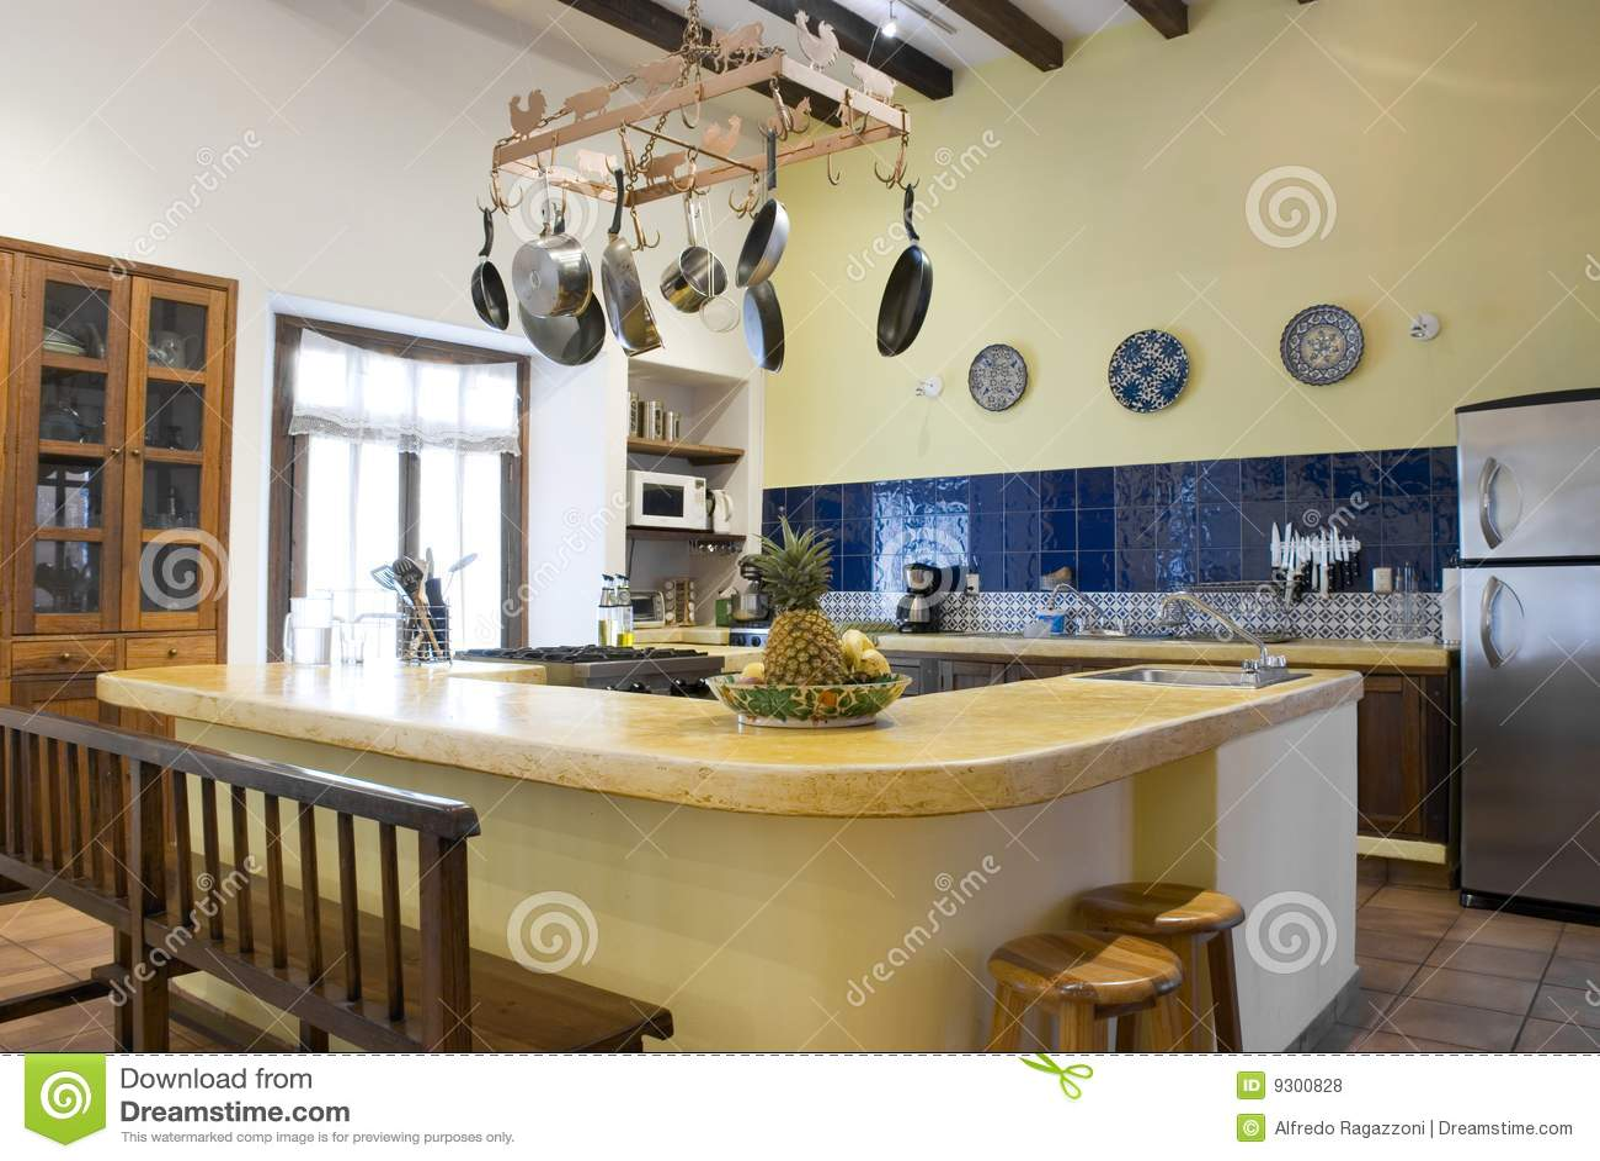 Beste Landküche Menüpreise Galerie - Küche Set Ideen ...